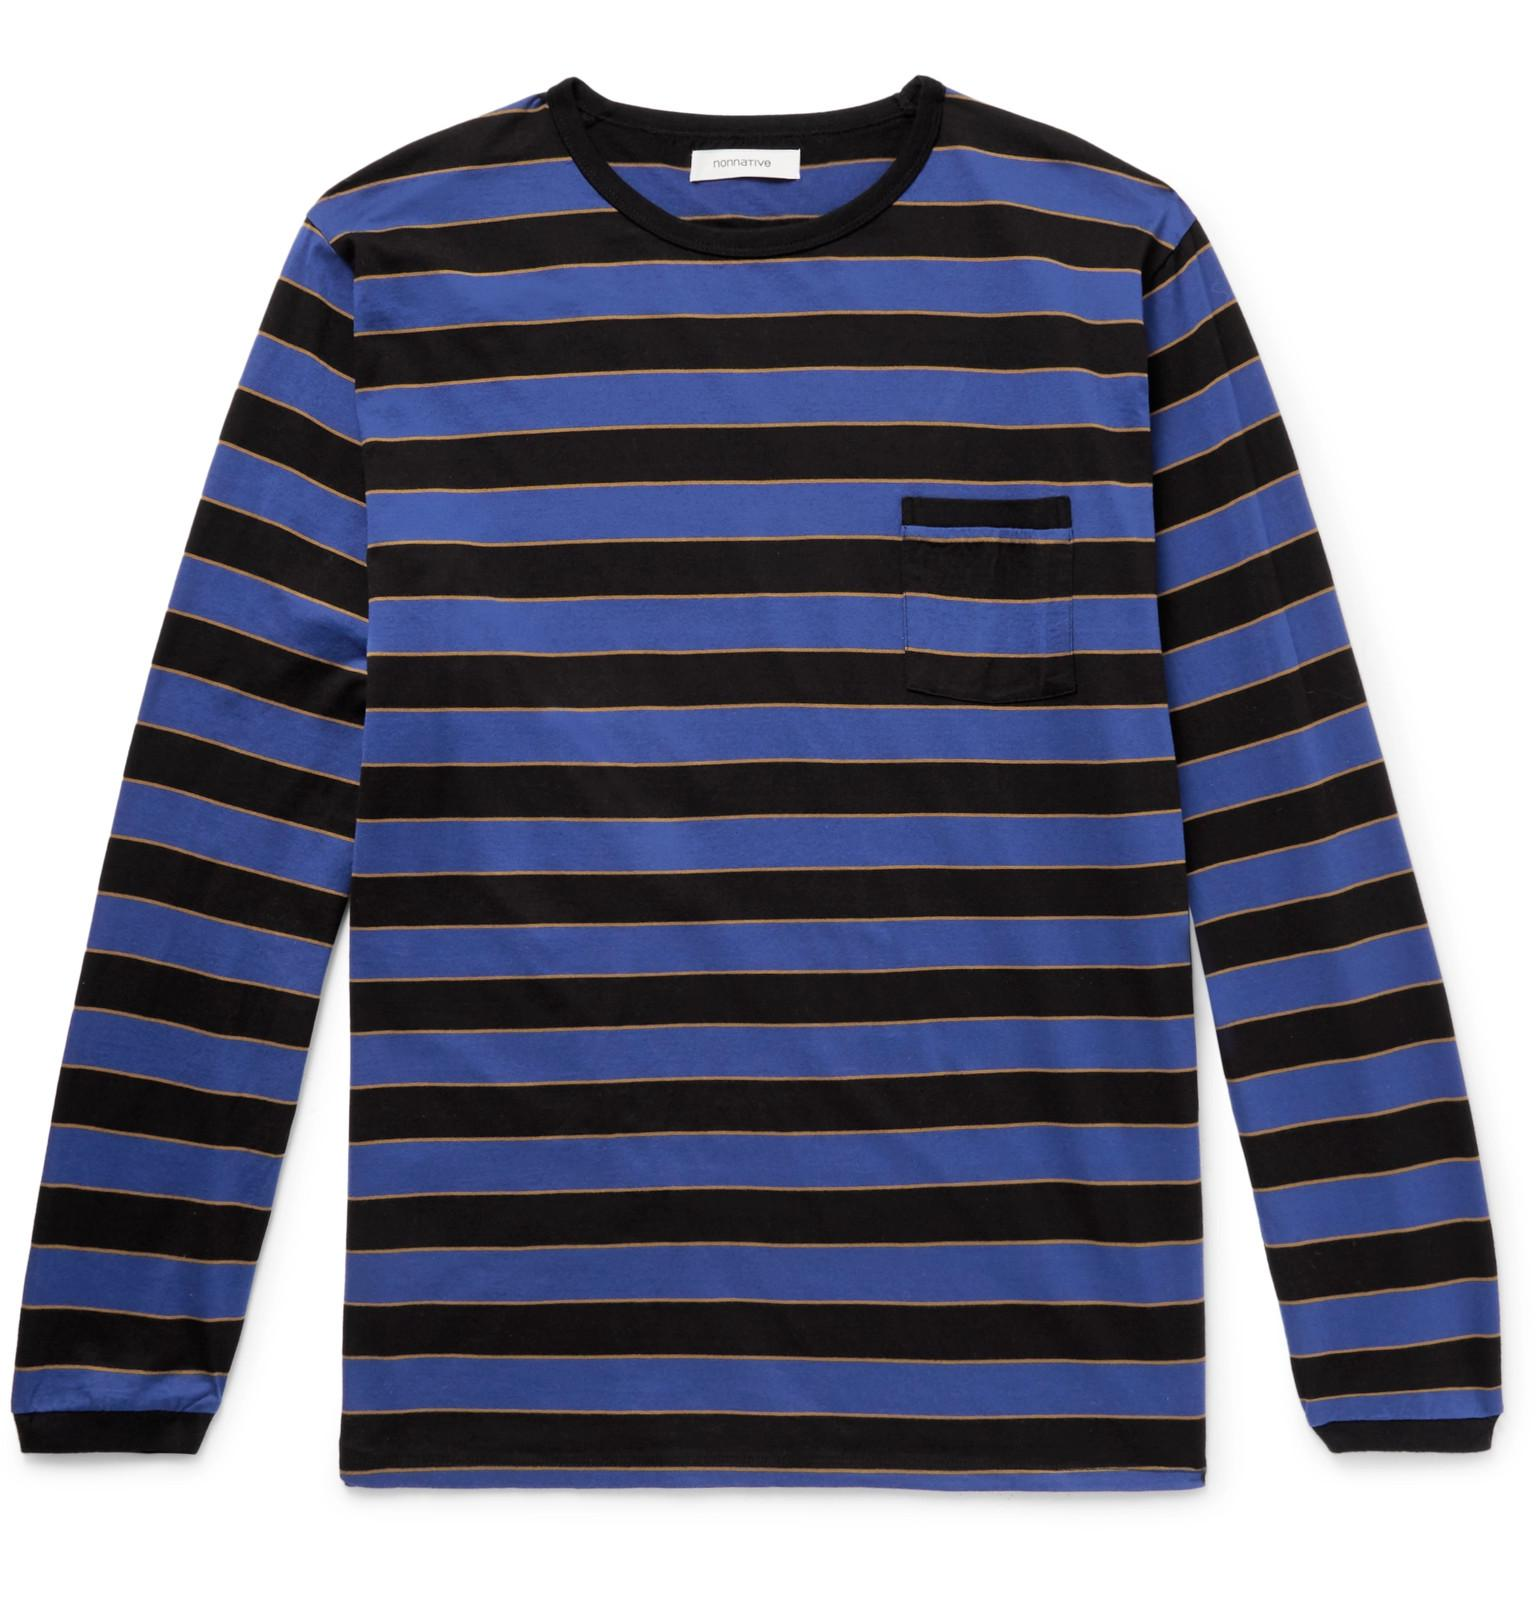 de a mangas Camiseta rayas algodón de sin jersey Nonnative gwWWqP4SU